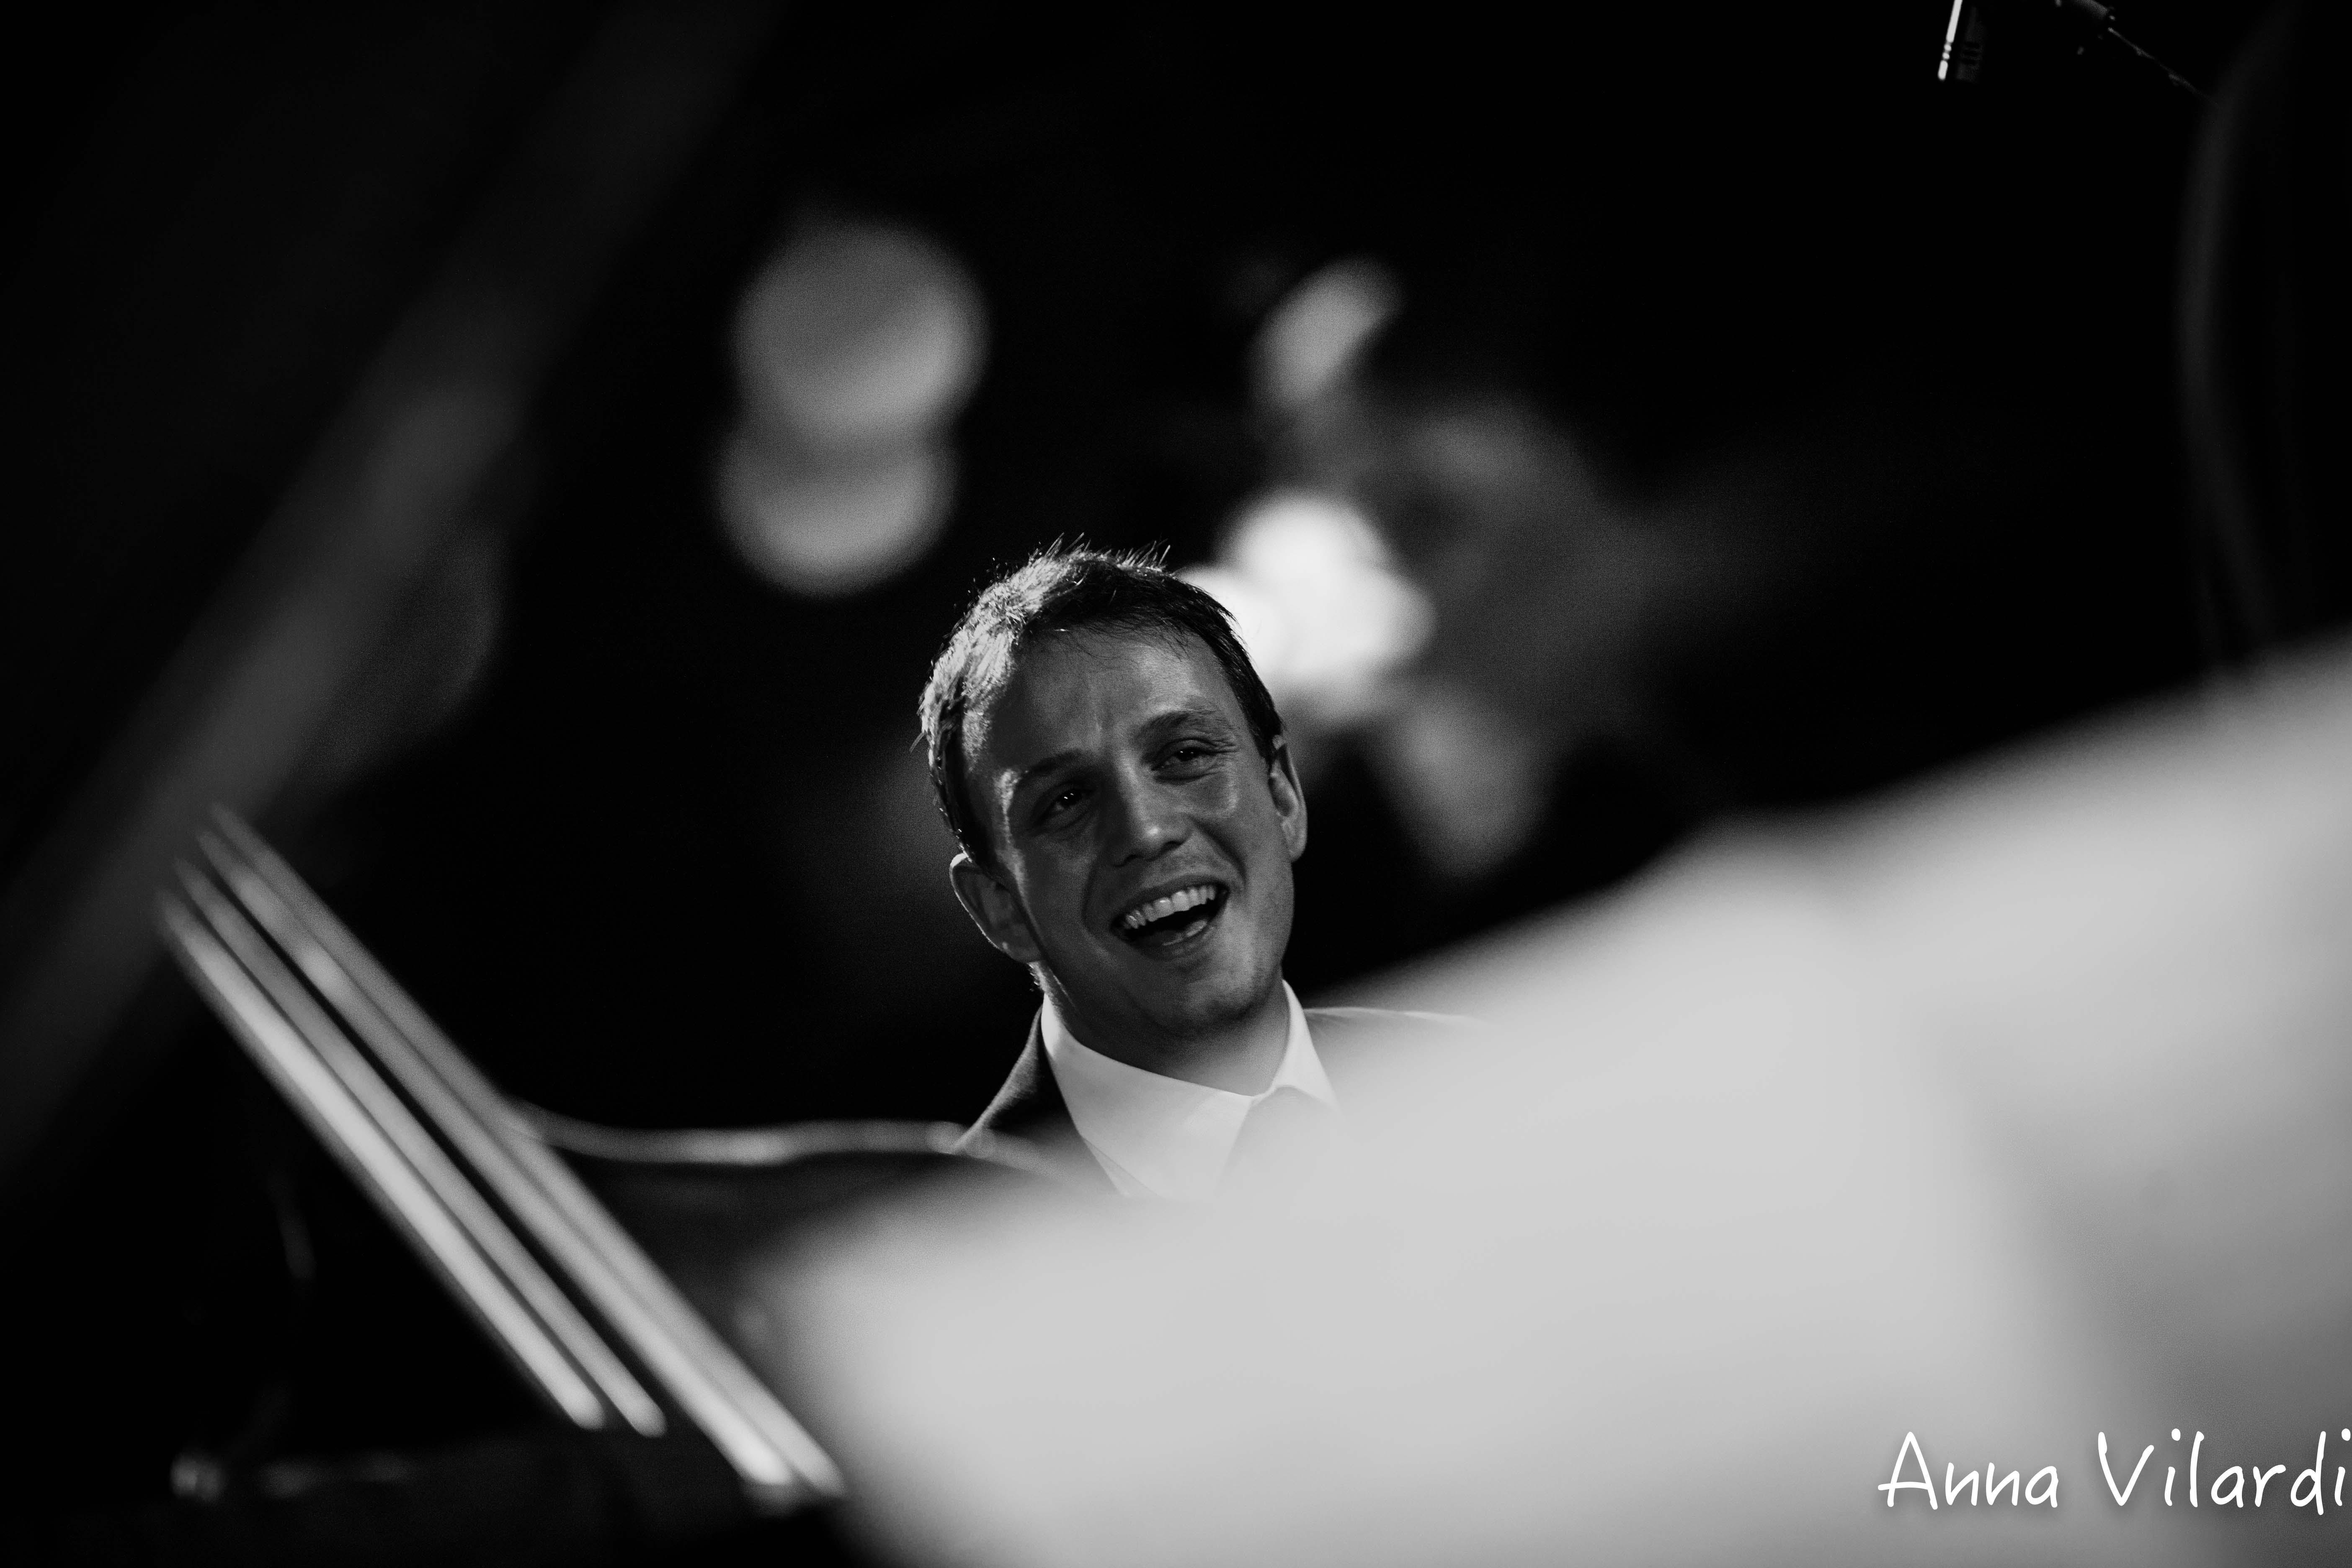 Benny Golson 4et live @Modo -Salerno ph Anna Vilardi